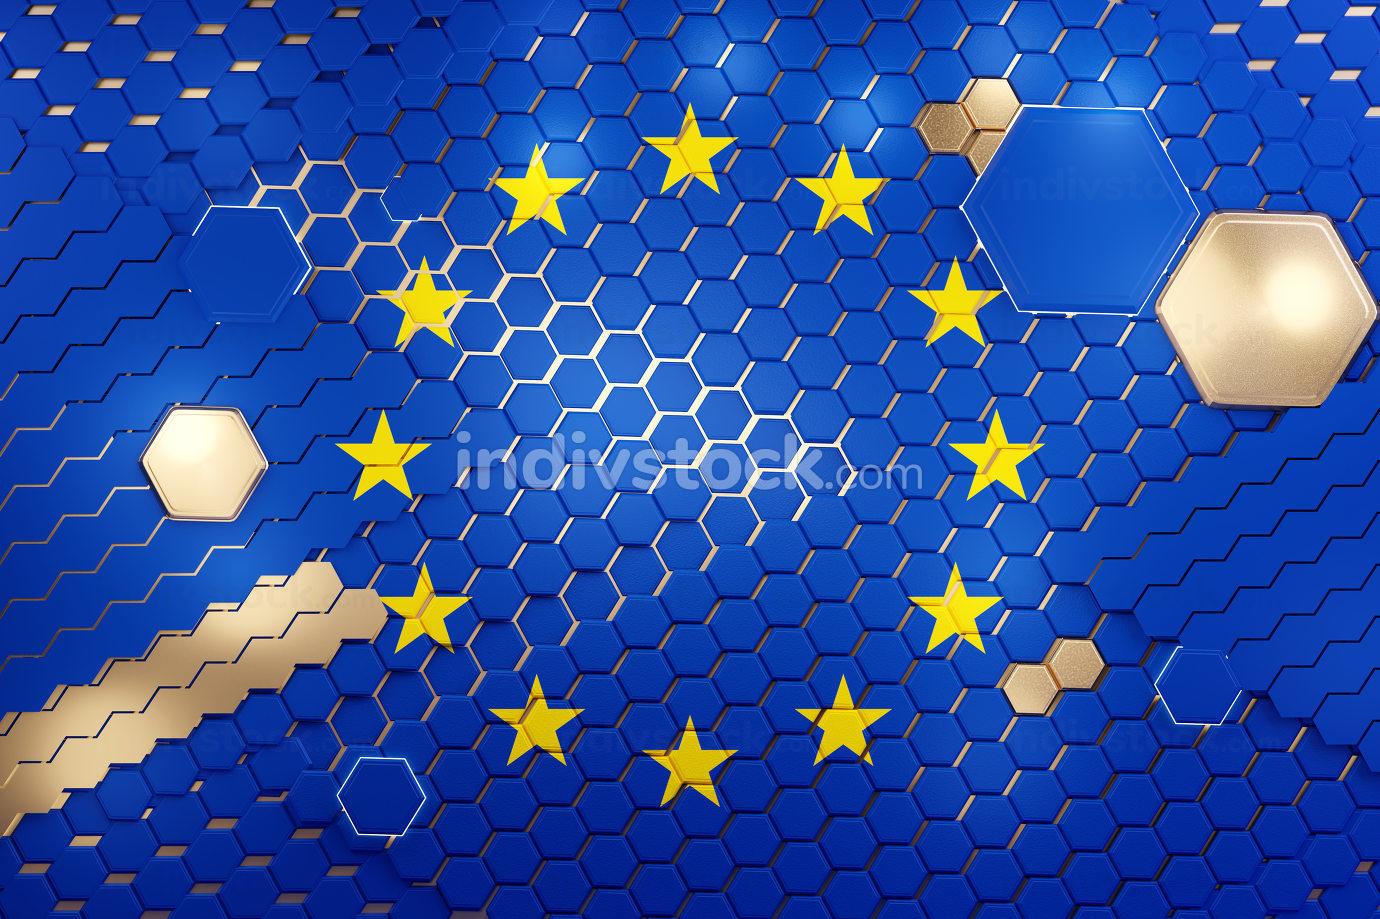 Europe EU hexagonal grid pattern design 3d-illustration backgrou